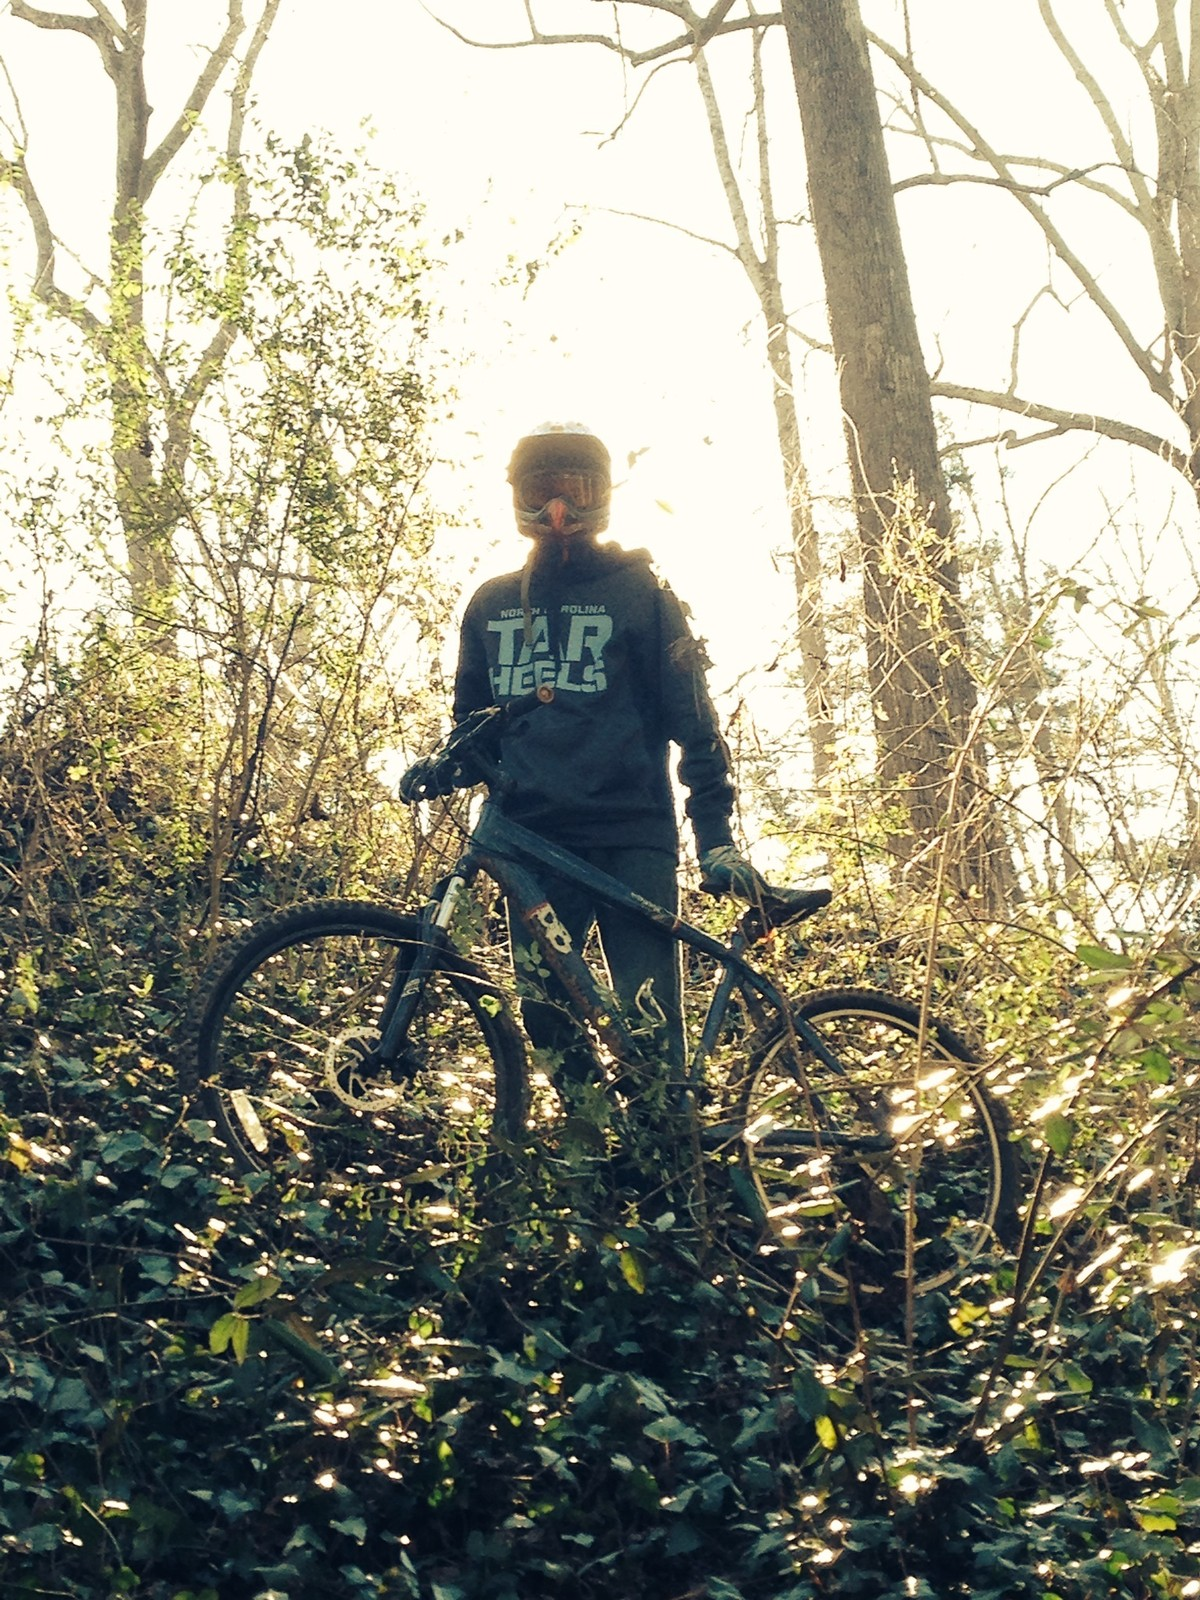 IMG 2497 - Ladavis83 - Mountain Biking Pictures - Vital MTB